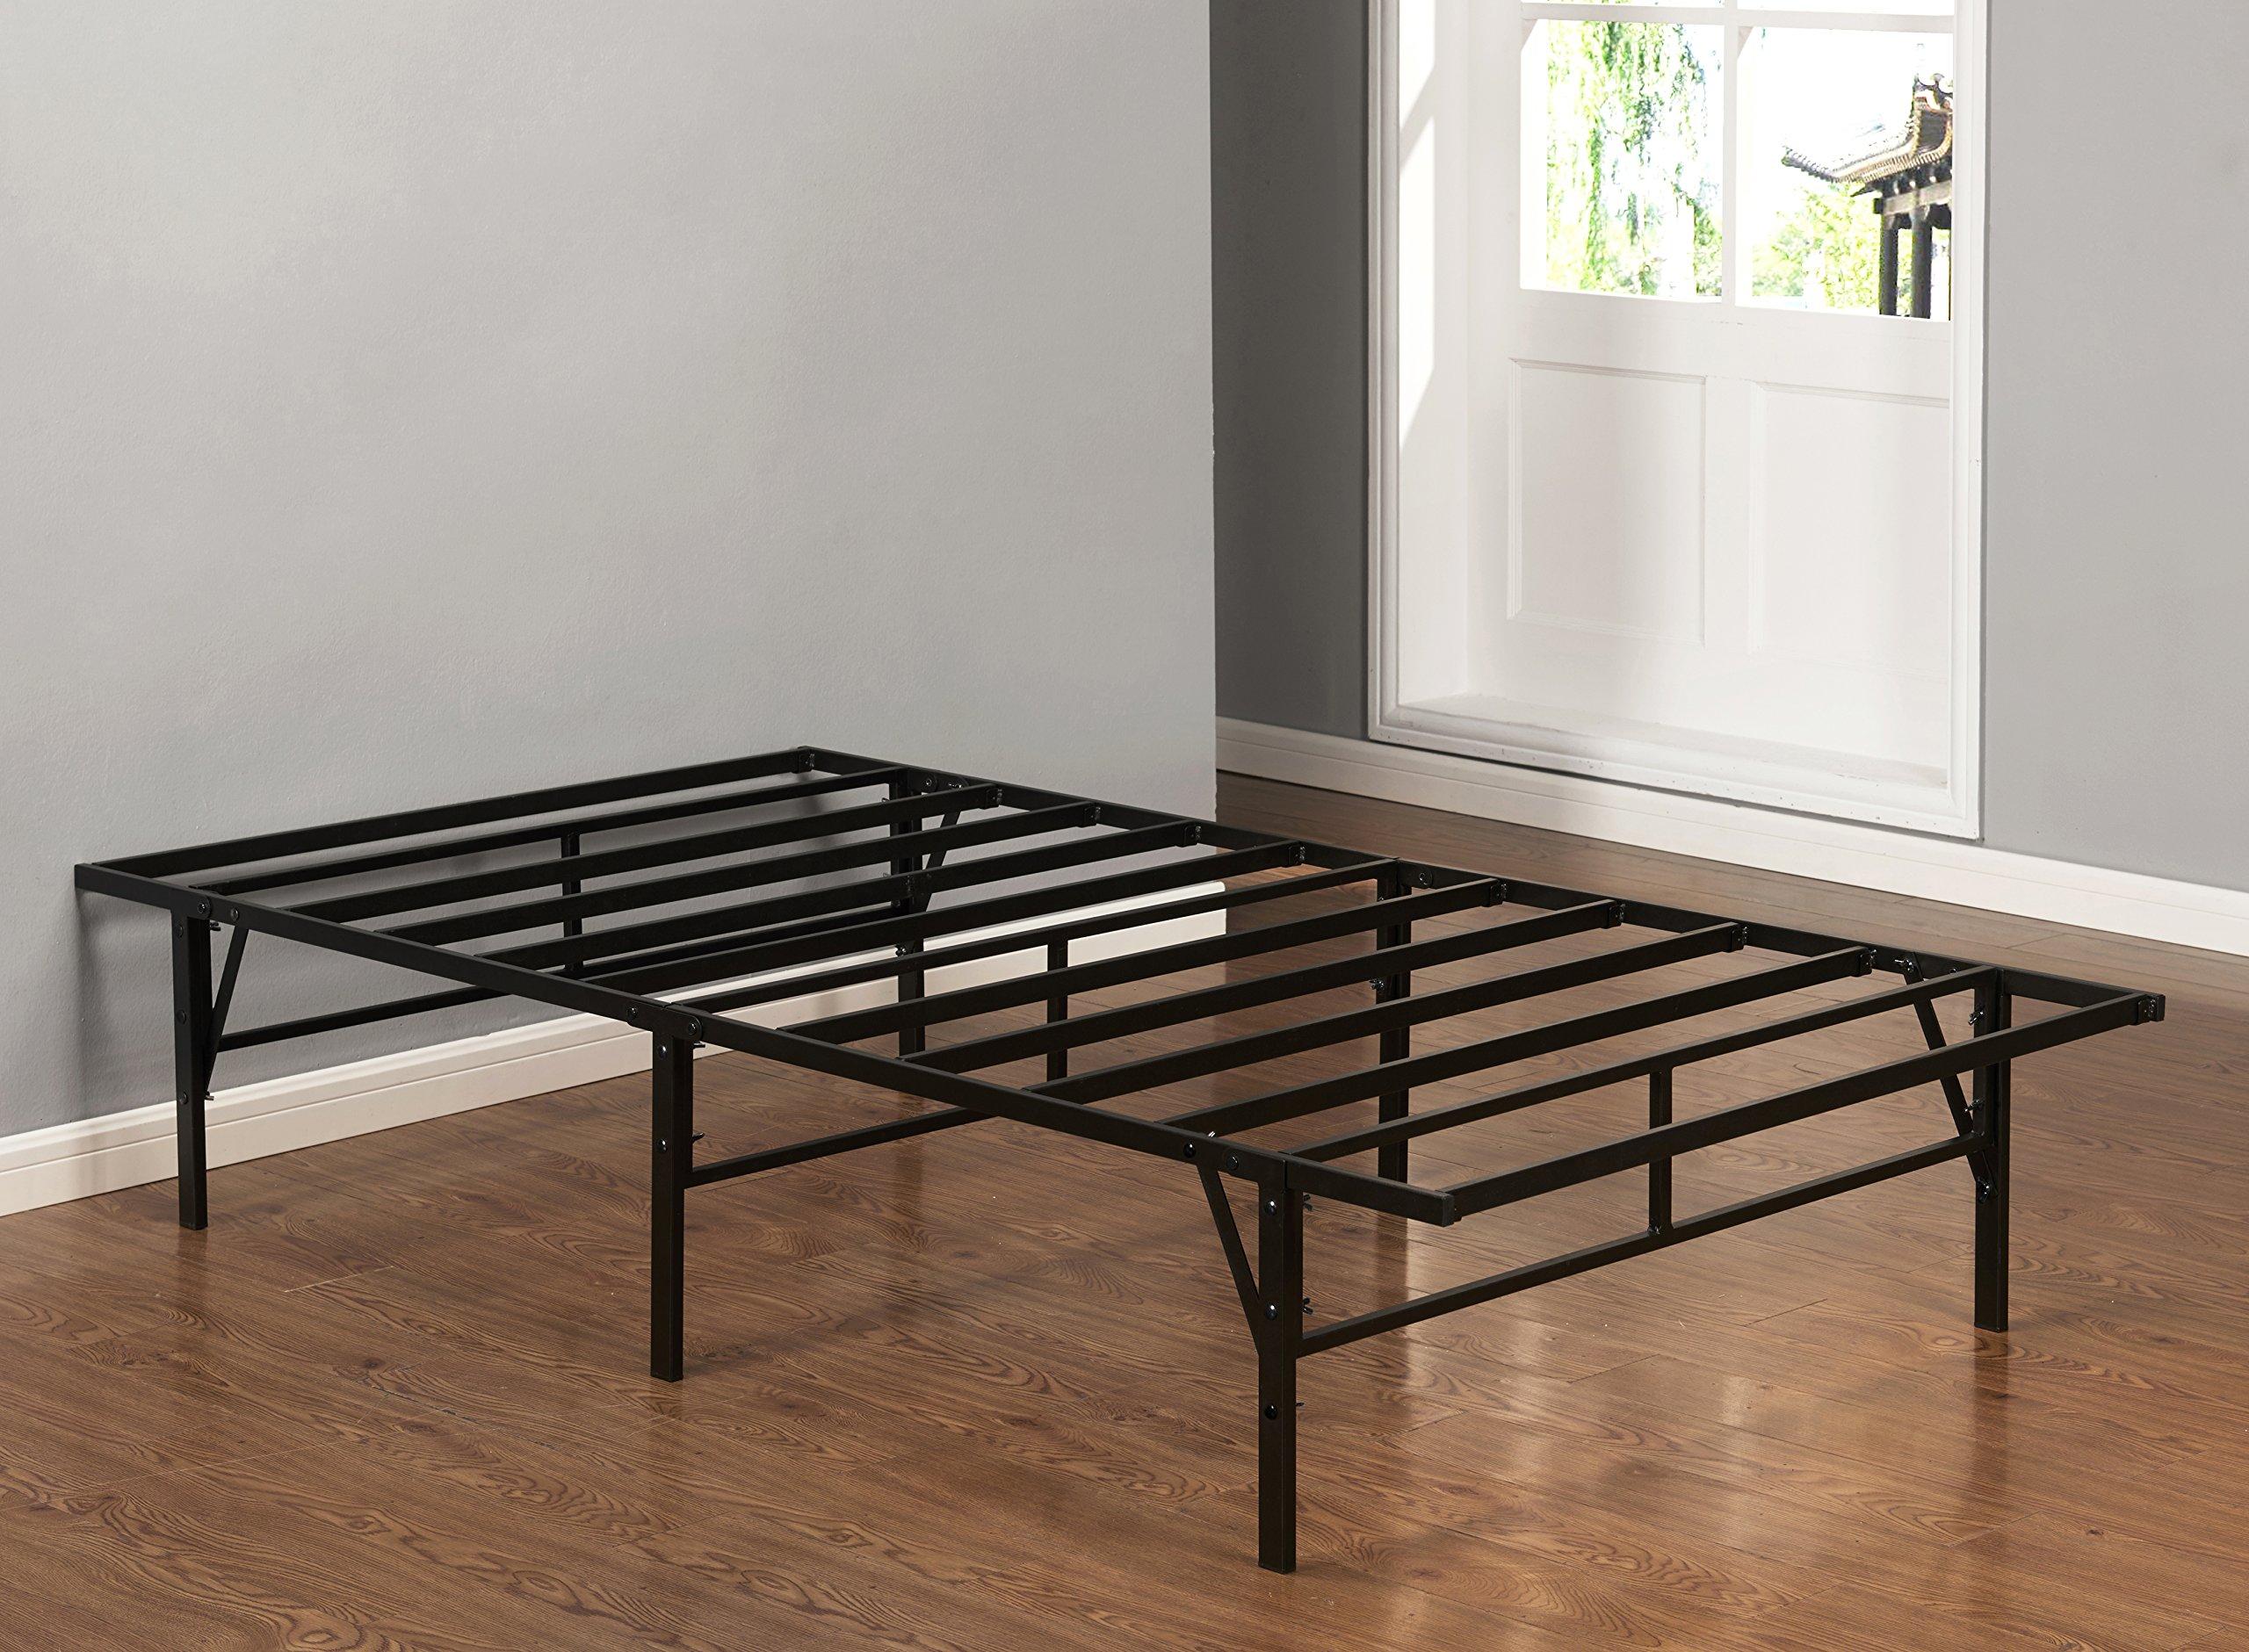 Kings Brand Furniture Platform Bed Frame Mattress Foundation/Box Spring Replacement, Twin